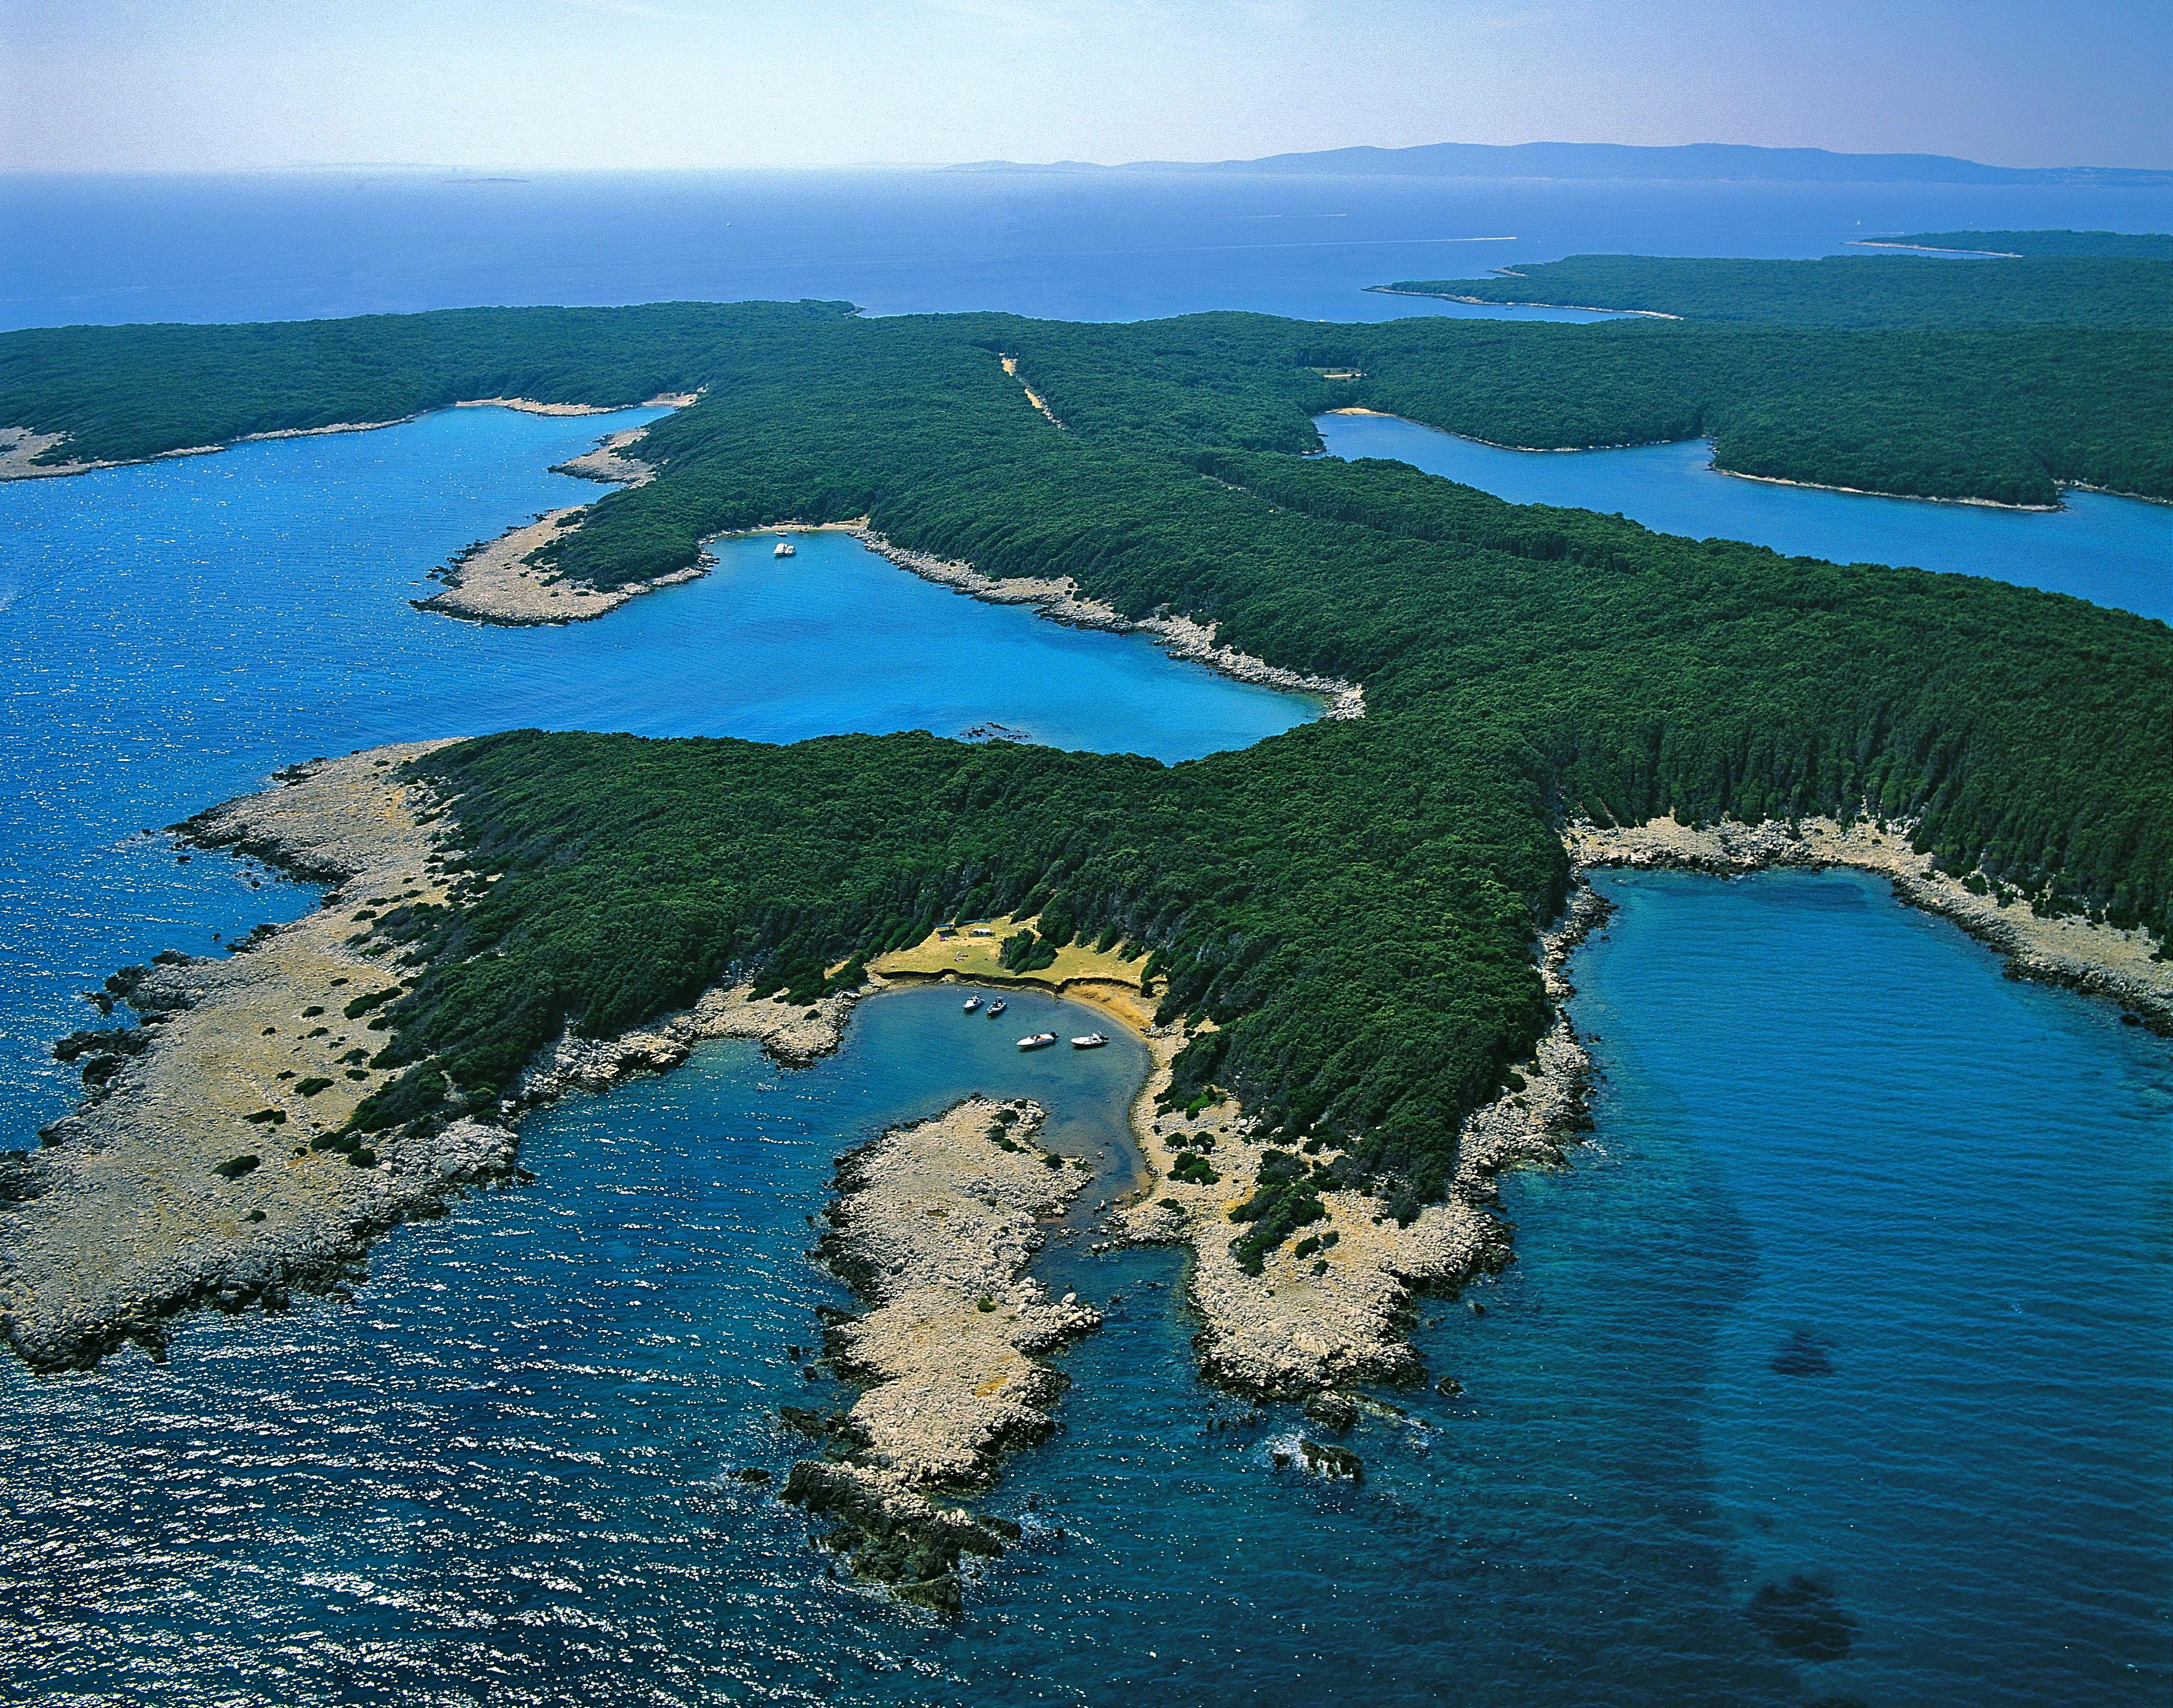 http://kongresguides.files.wordpress.com/2012/02/towns_and_islands-punta_kriza1.jpg